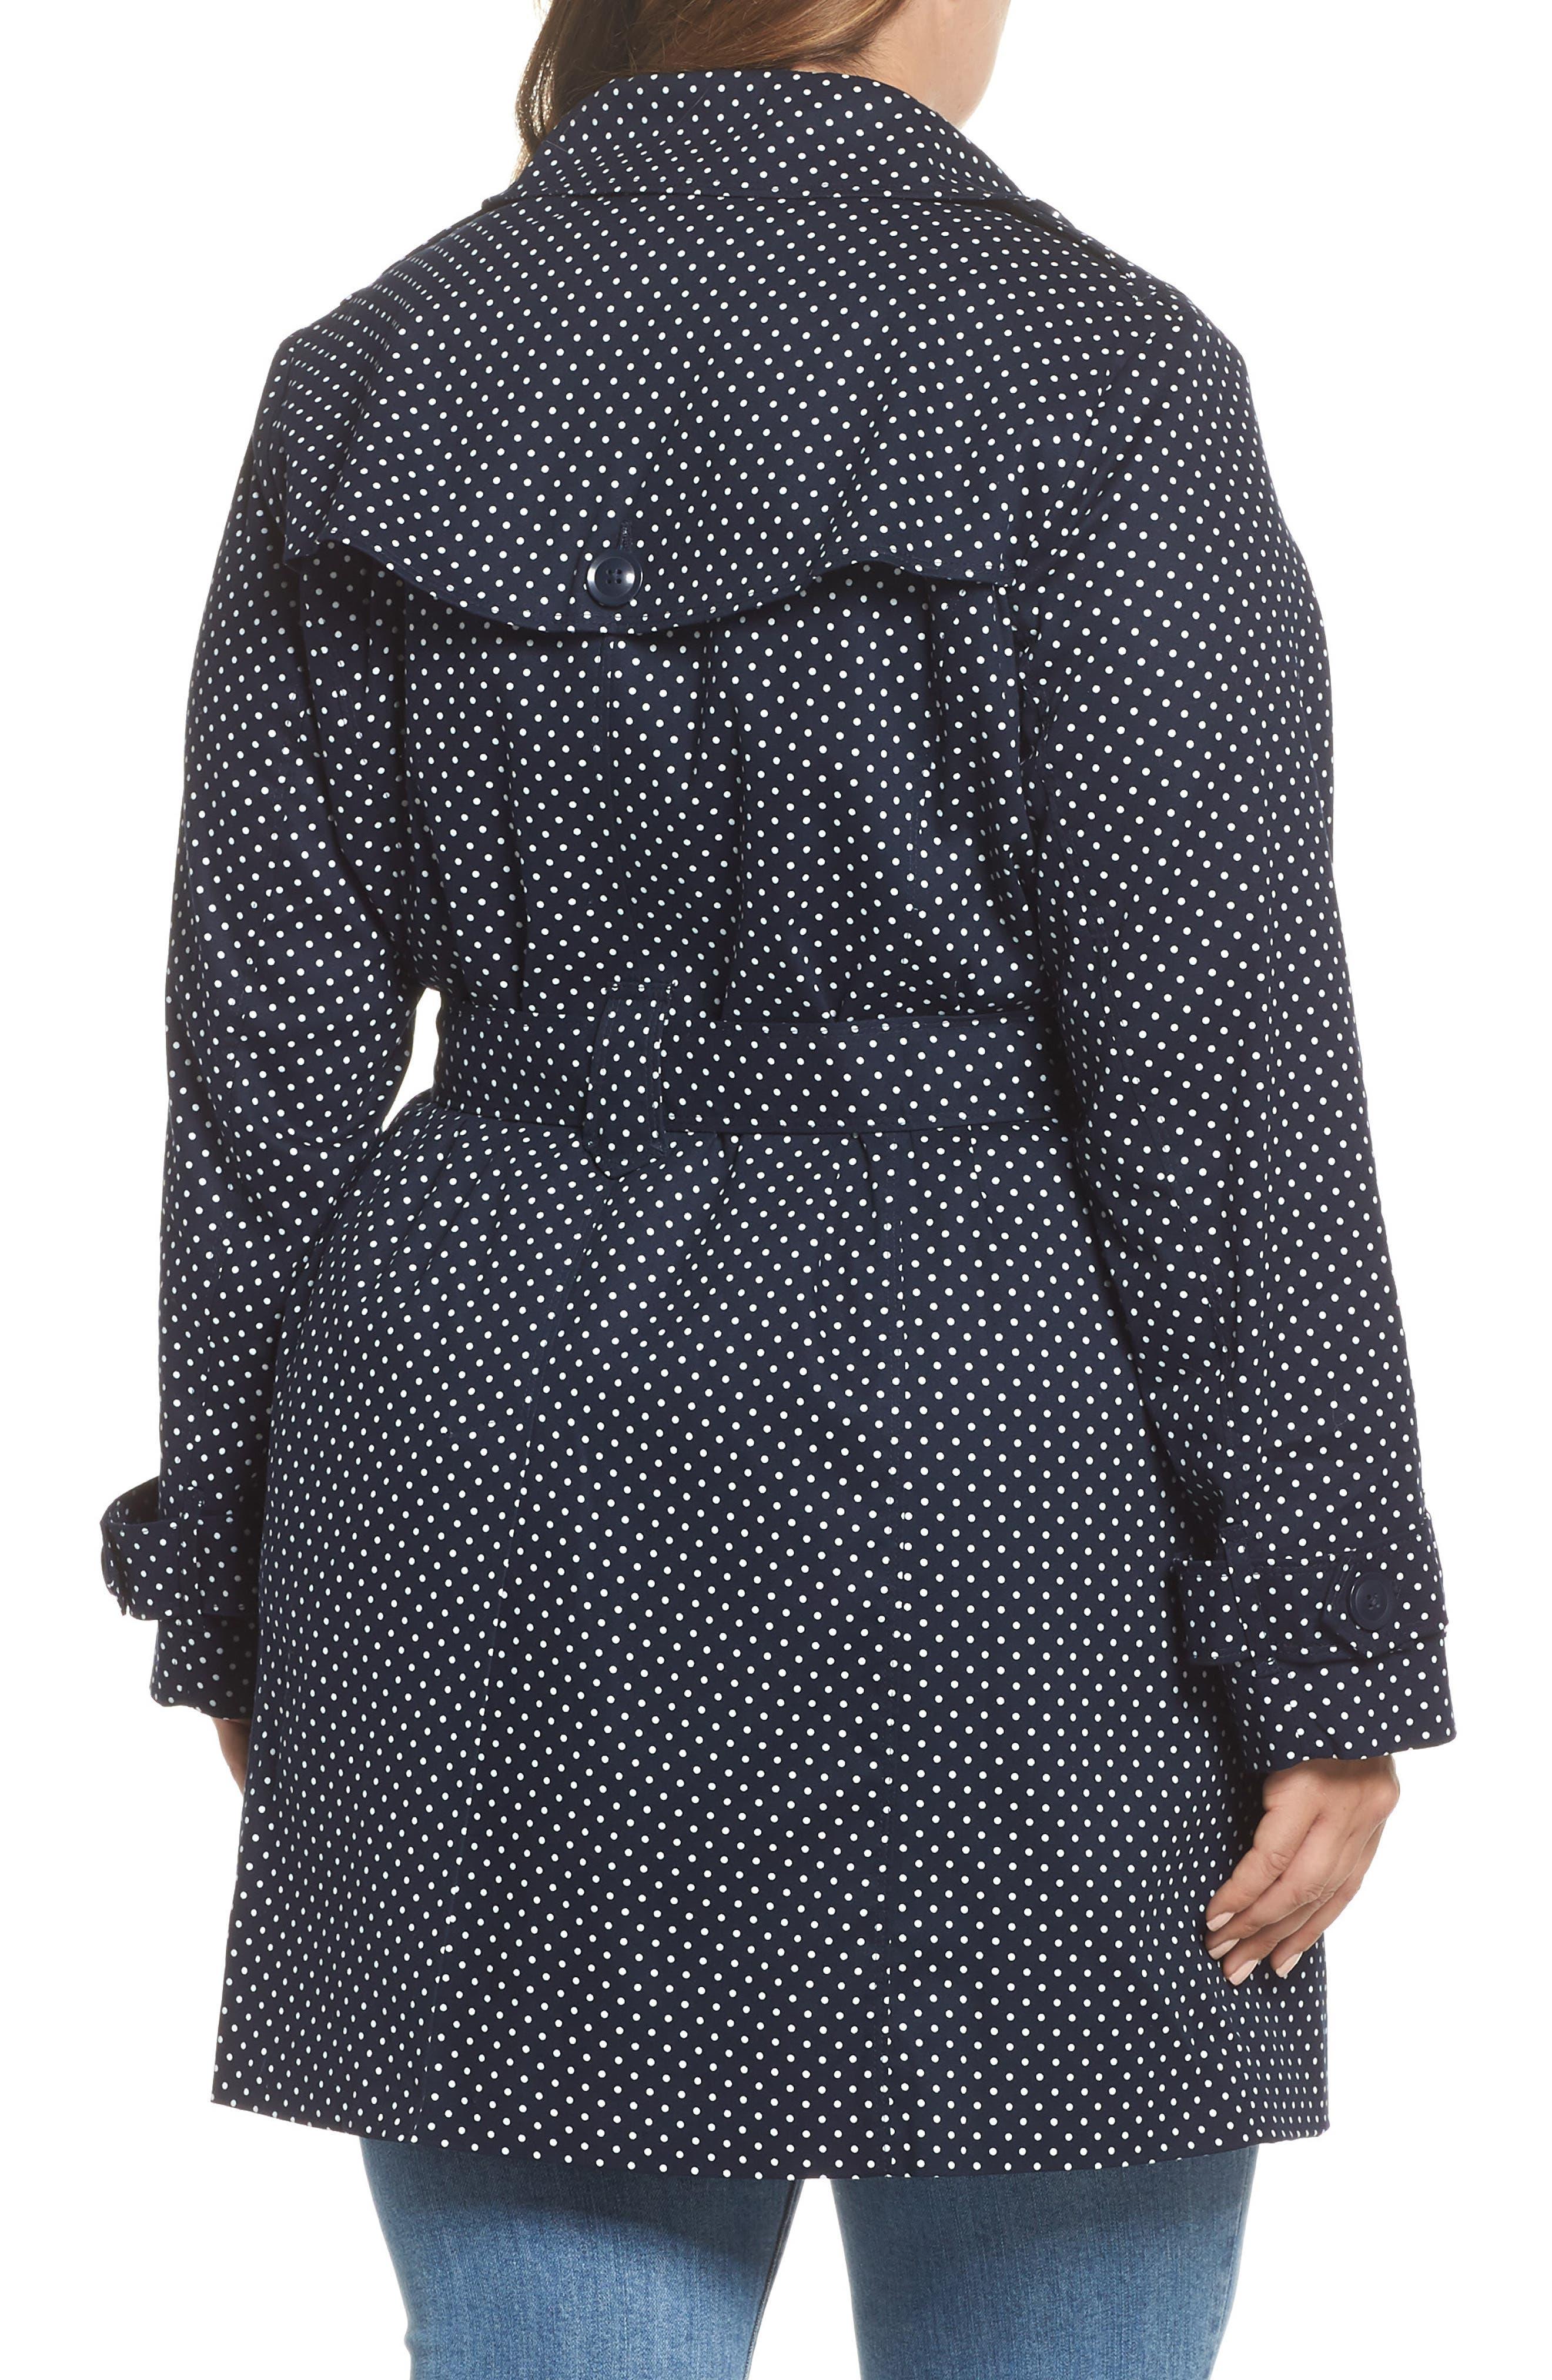 Polka Dot Single Breasted Trench Coat,                             Alternate thumbnail 3, color,                             410